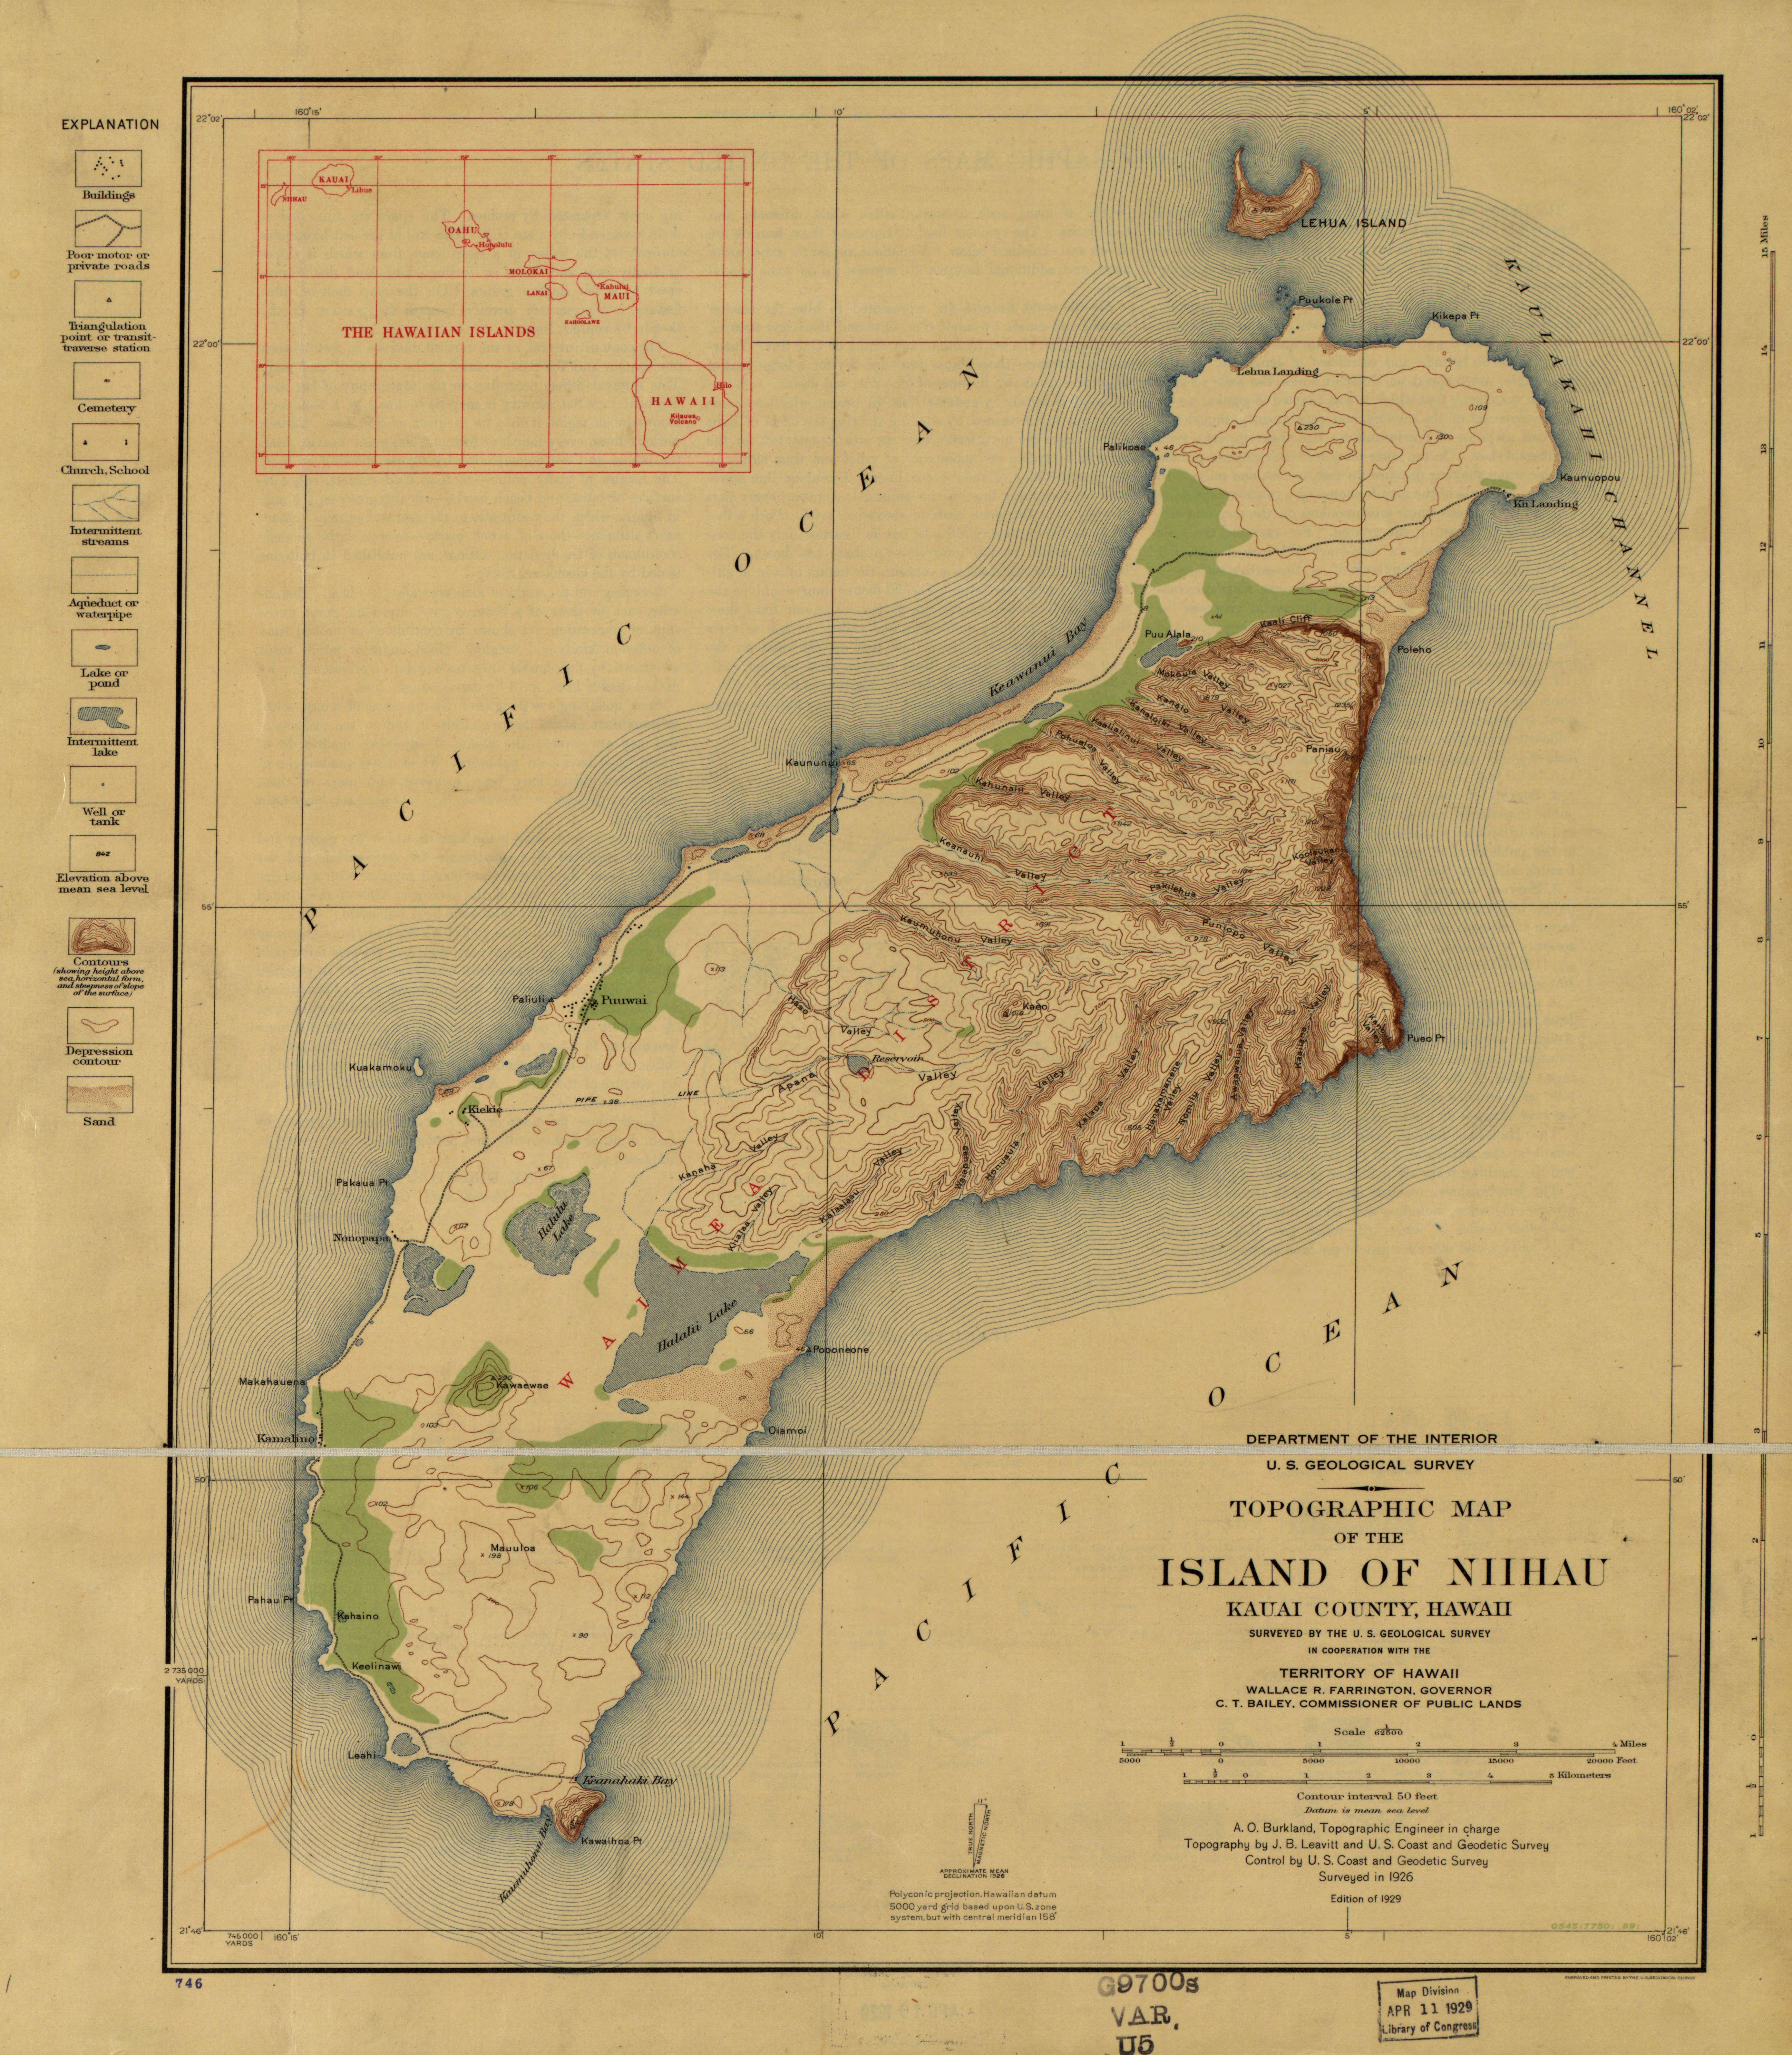 File Topographic Map Of The Island Of Niihau Kauai County Hawaii